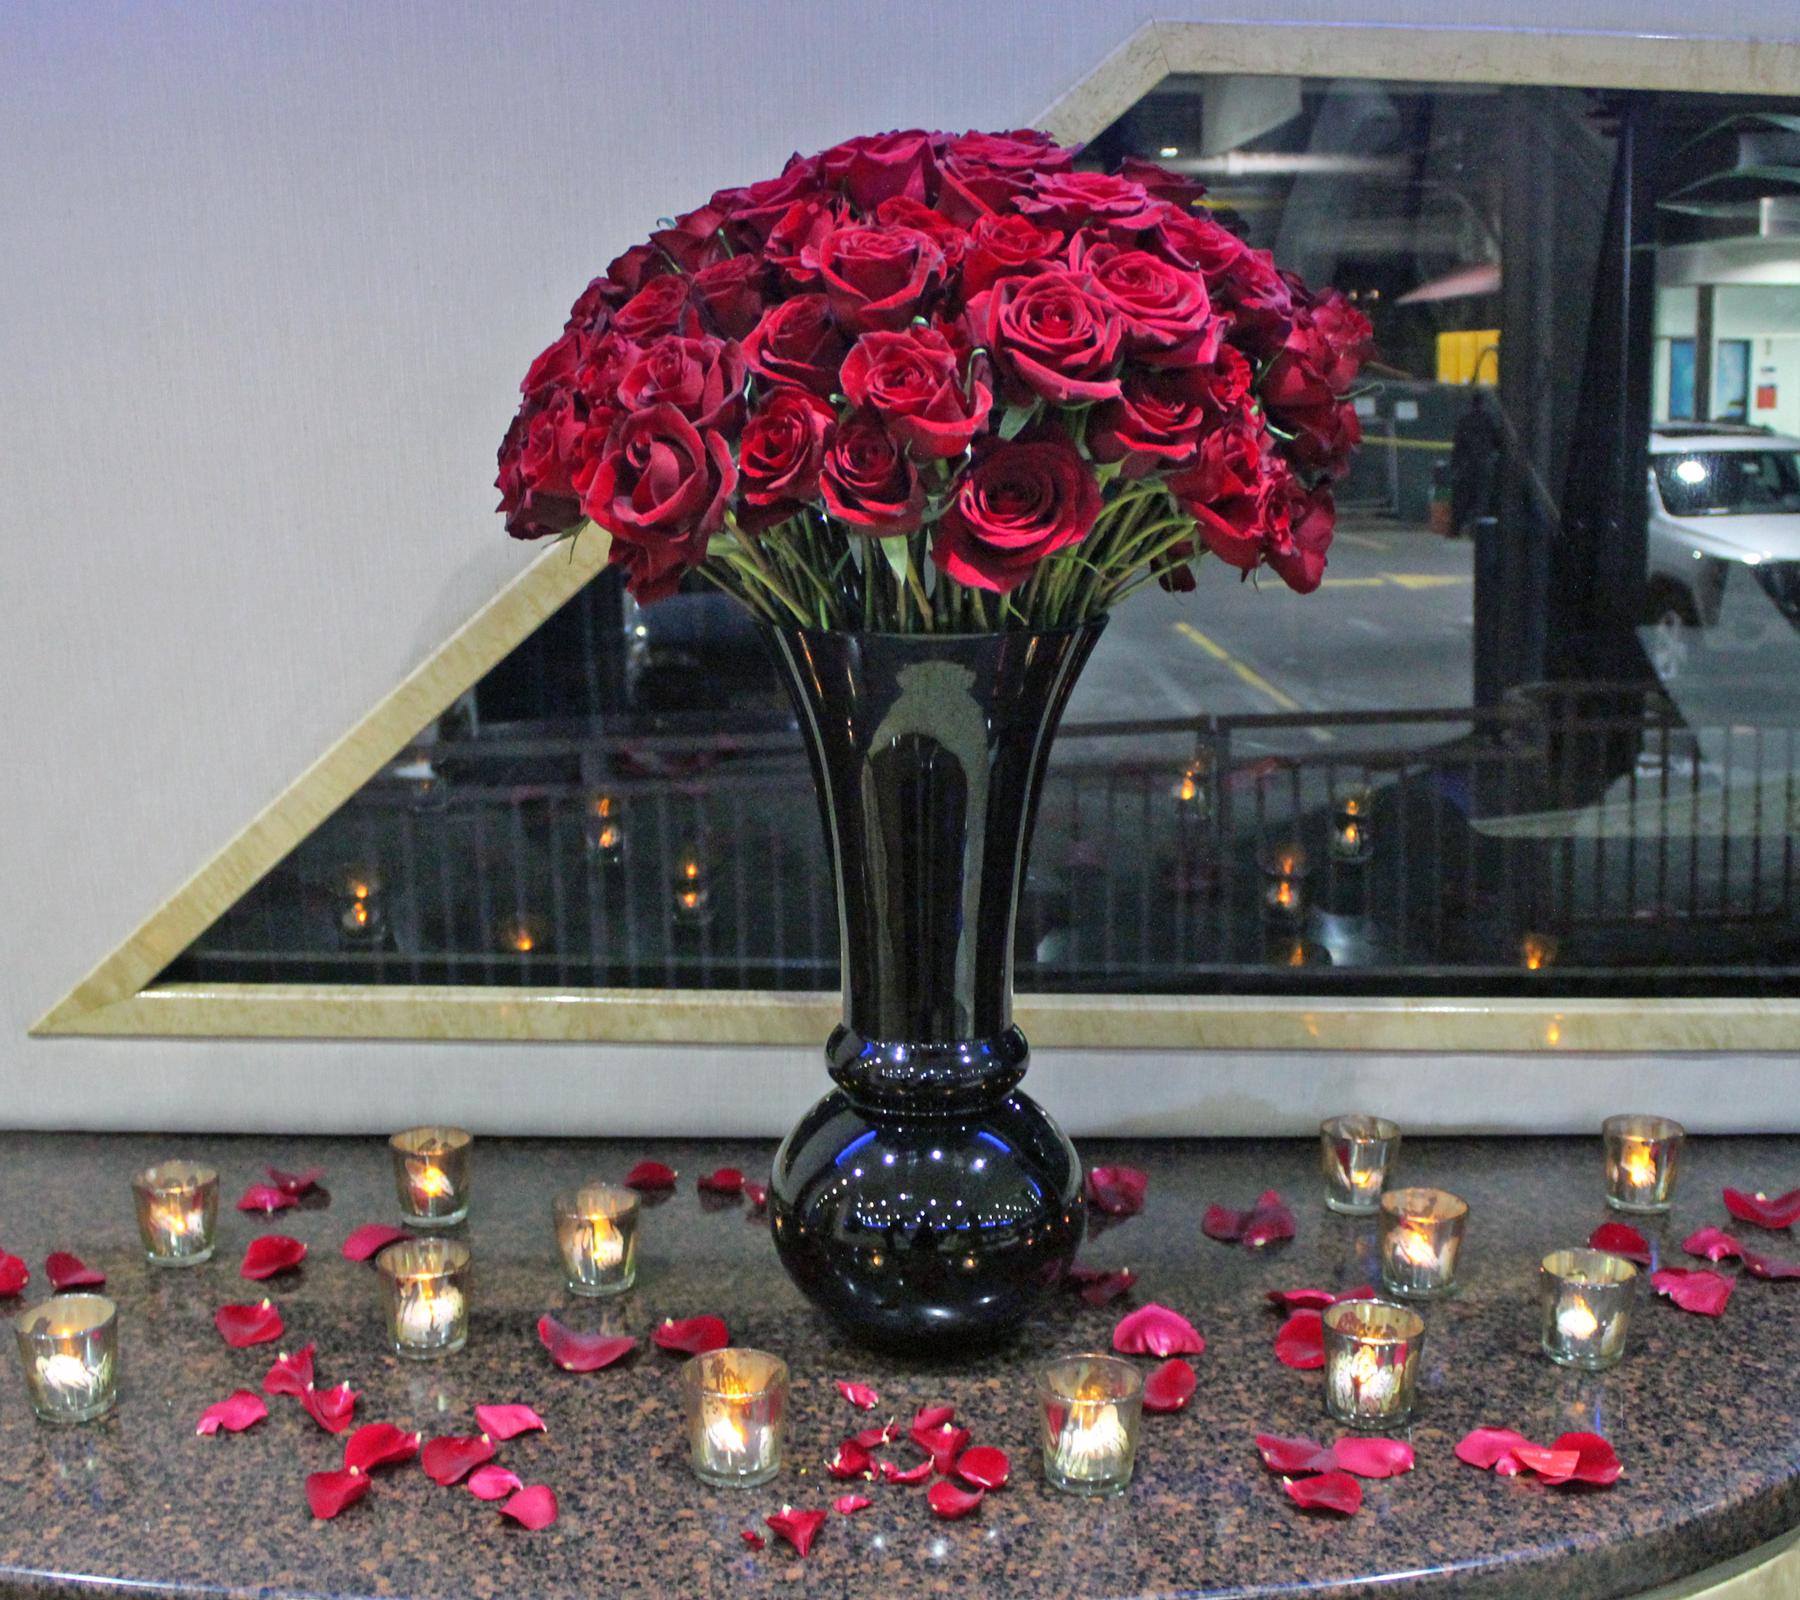 101-roses